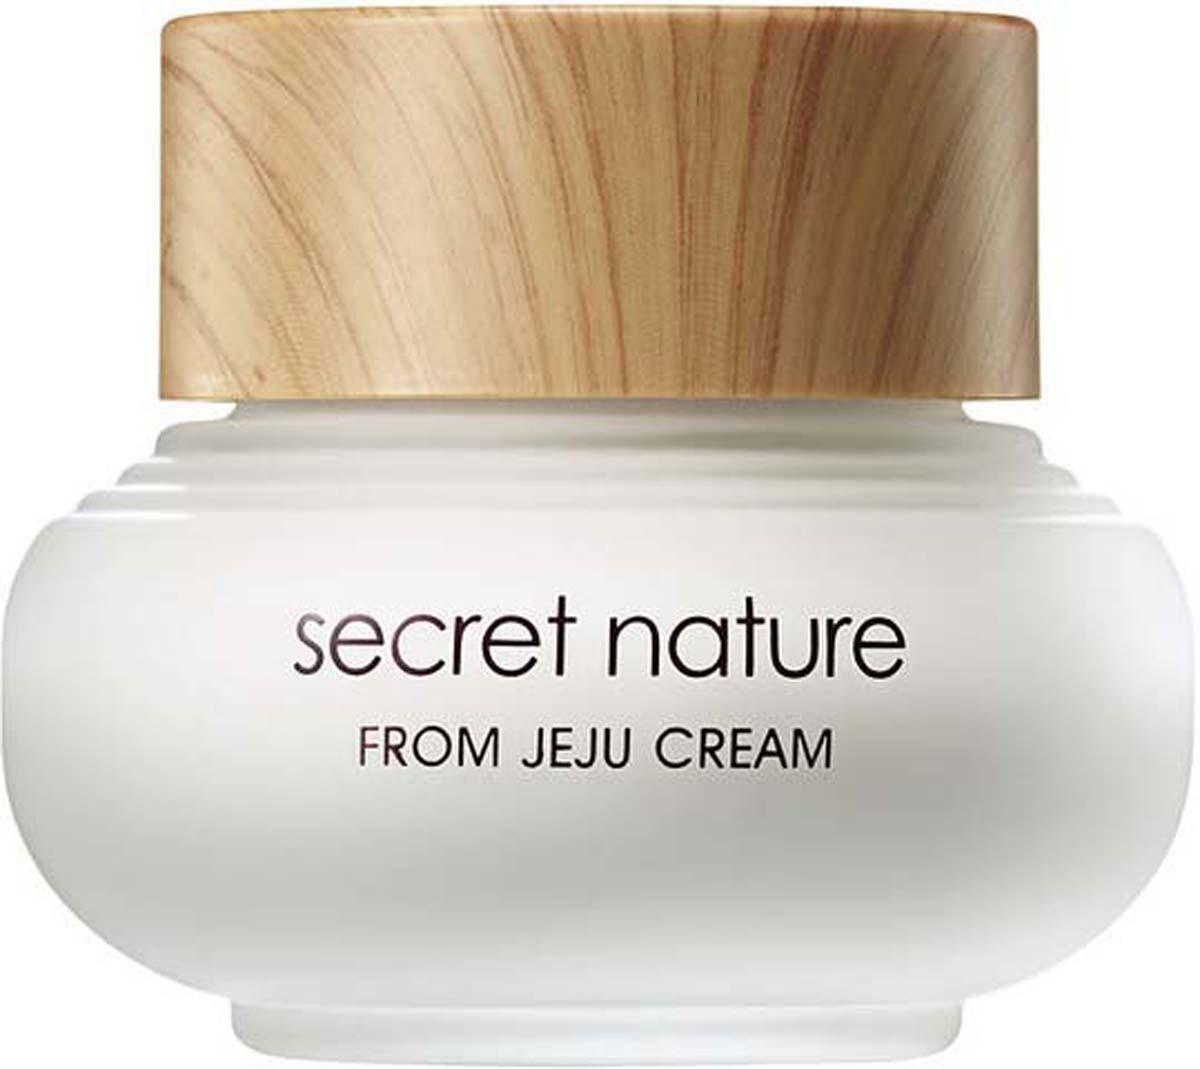 Secret Nature From Jeju Cream Увлажняющий крем с зеленым чаем, 50 мл крем secret key snow white moisture cream 50 мл